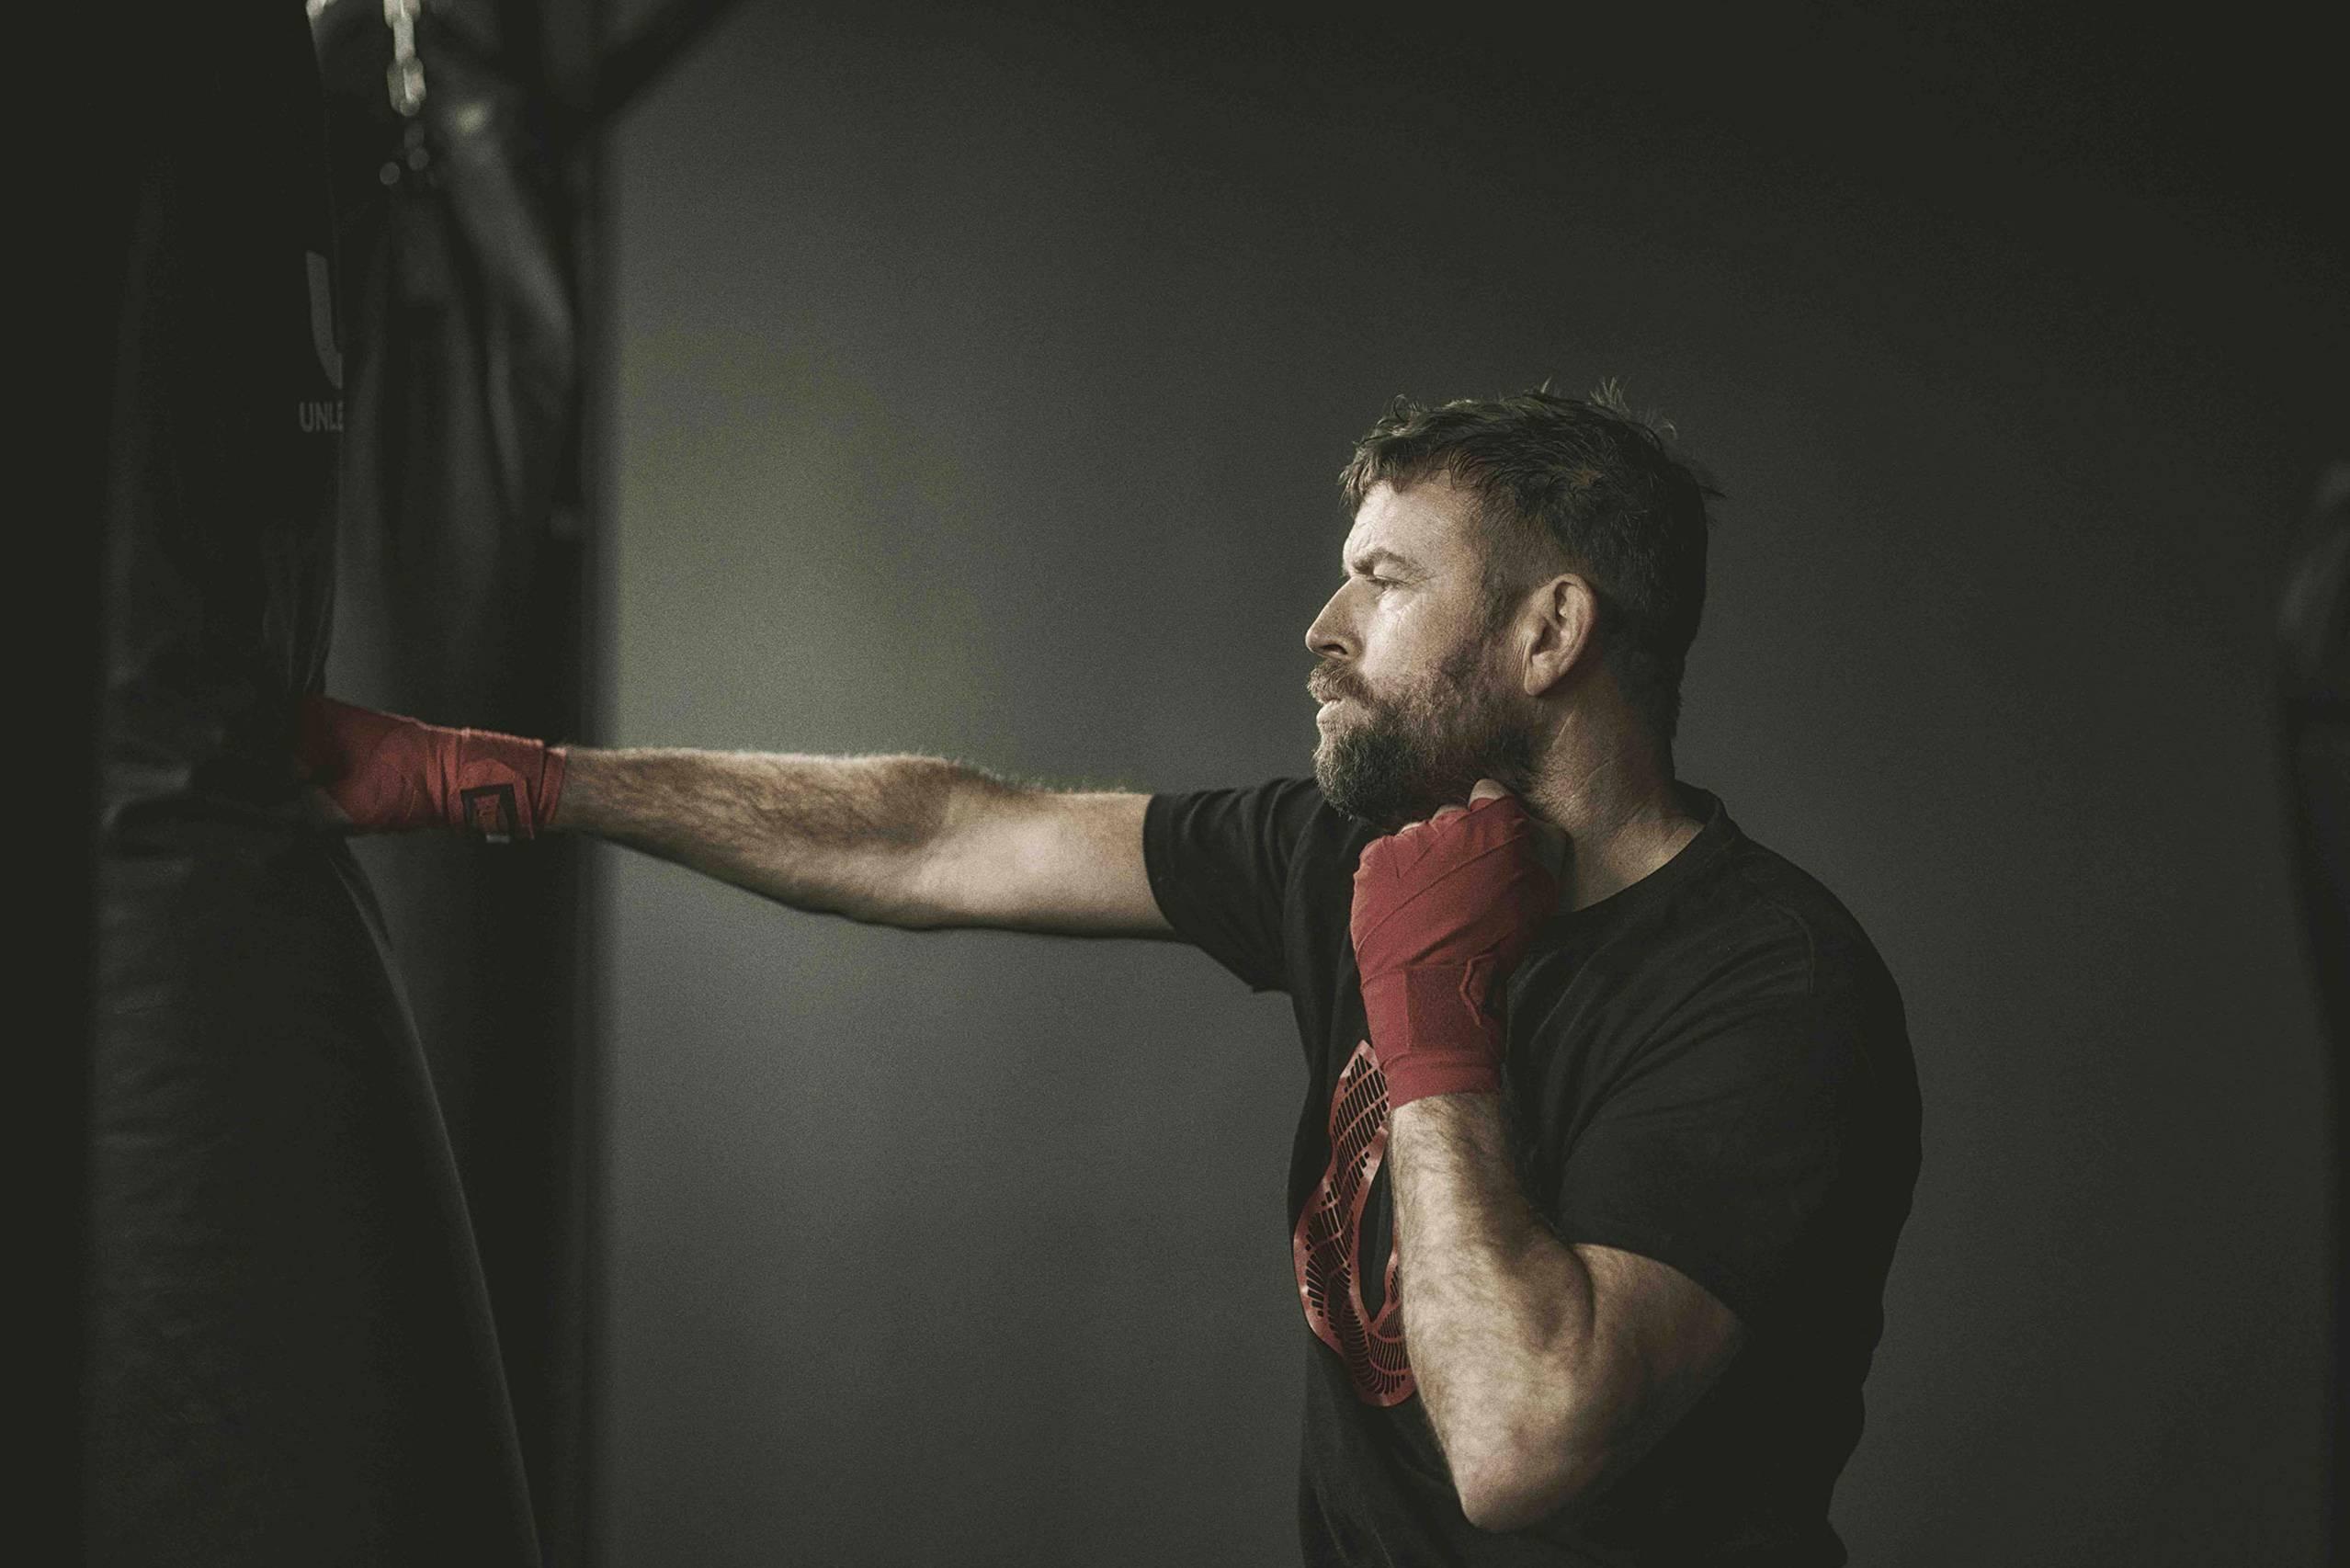 Personal training mannen zeger hoorn